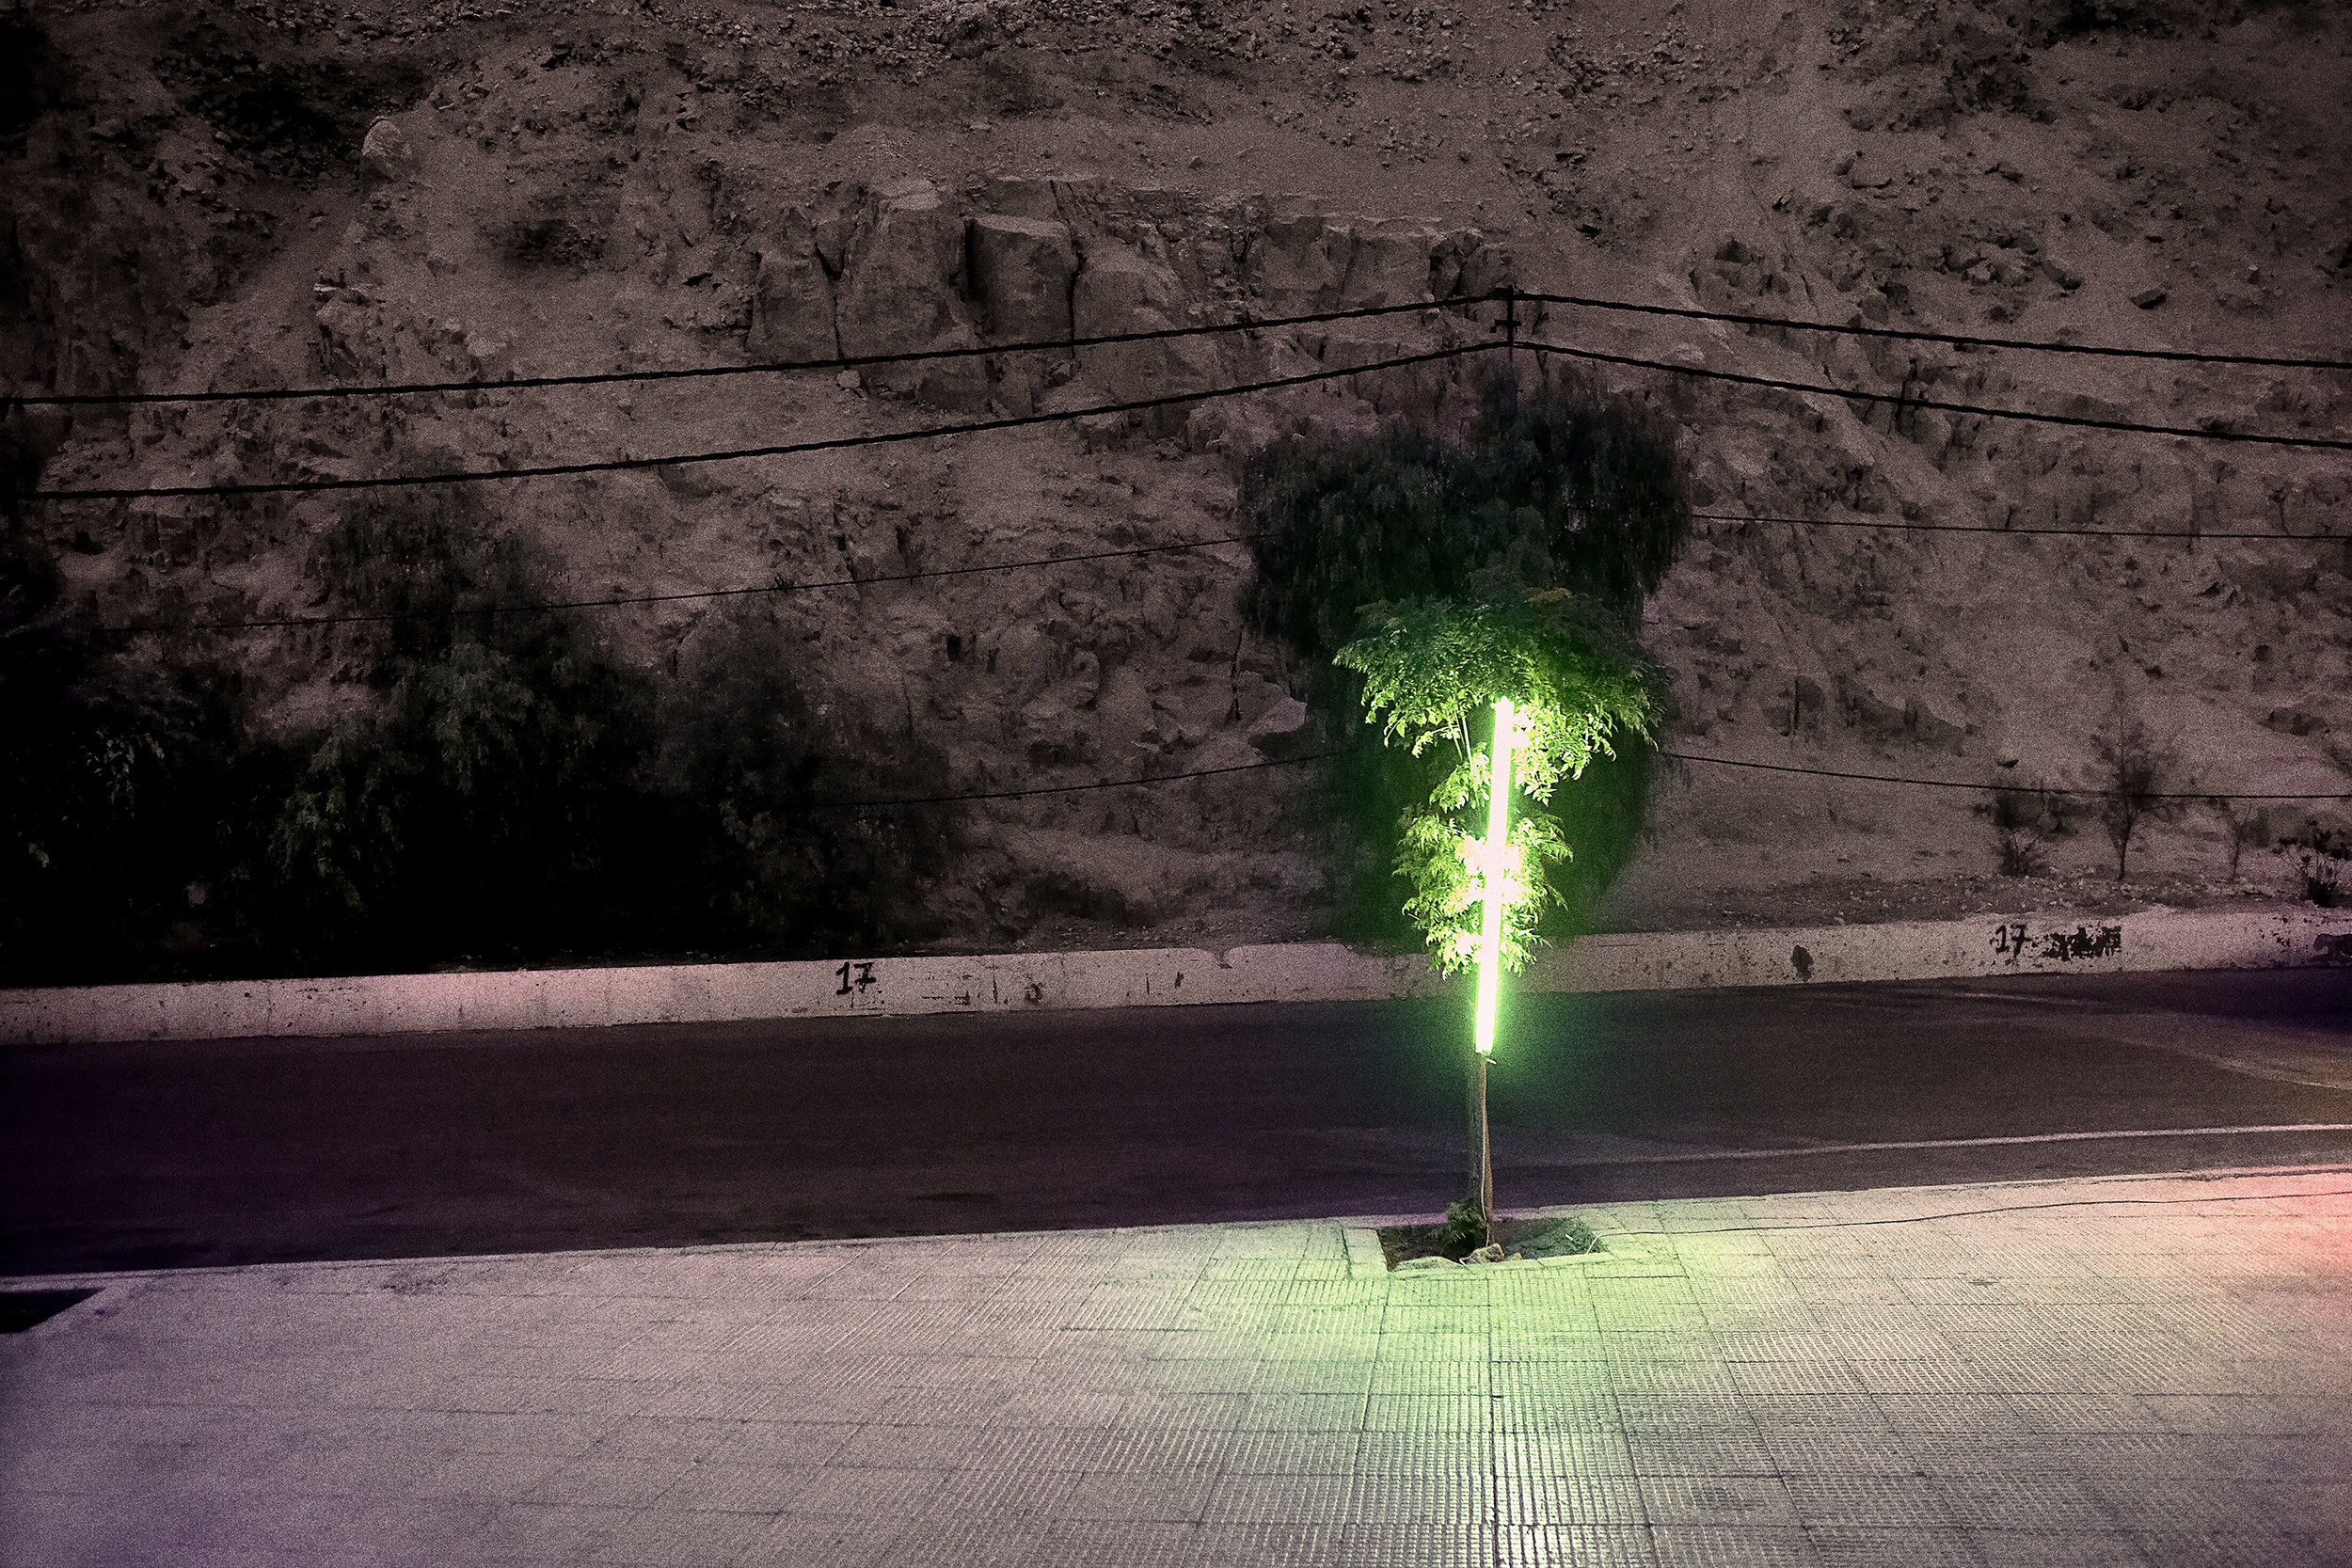 Syria Light #2